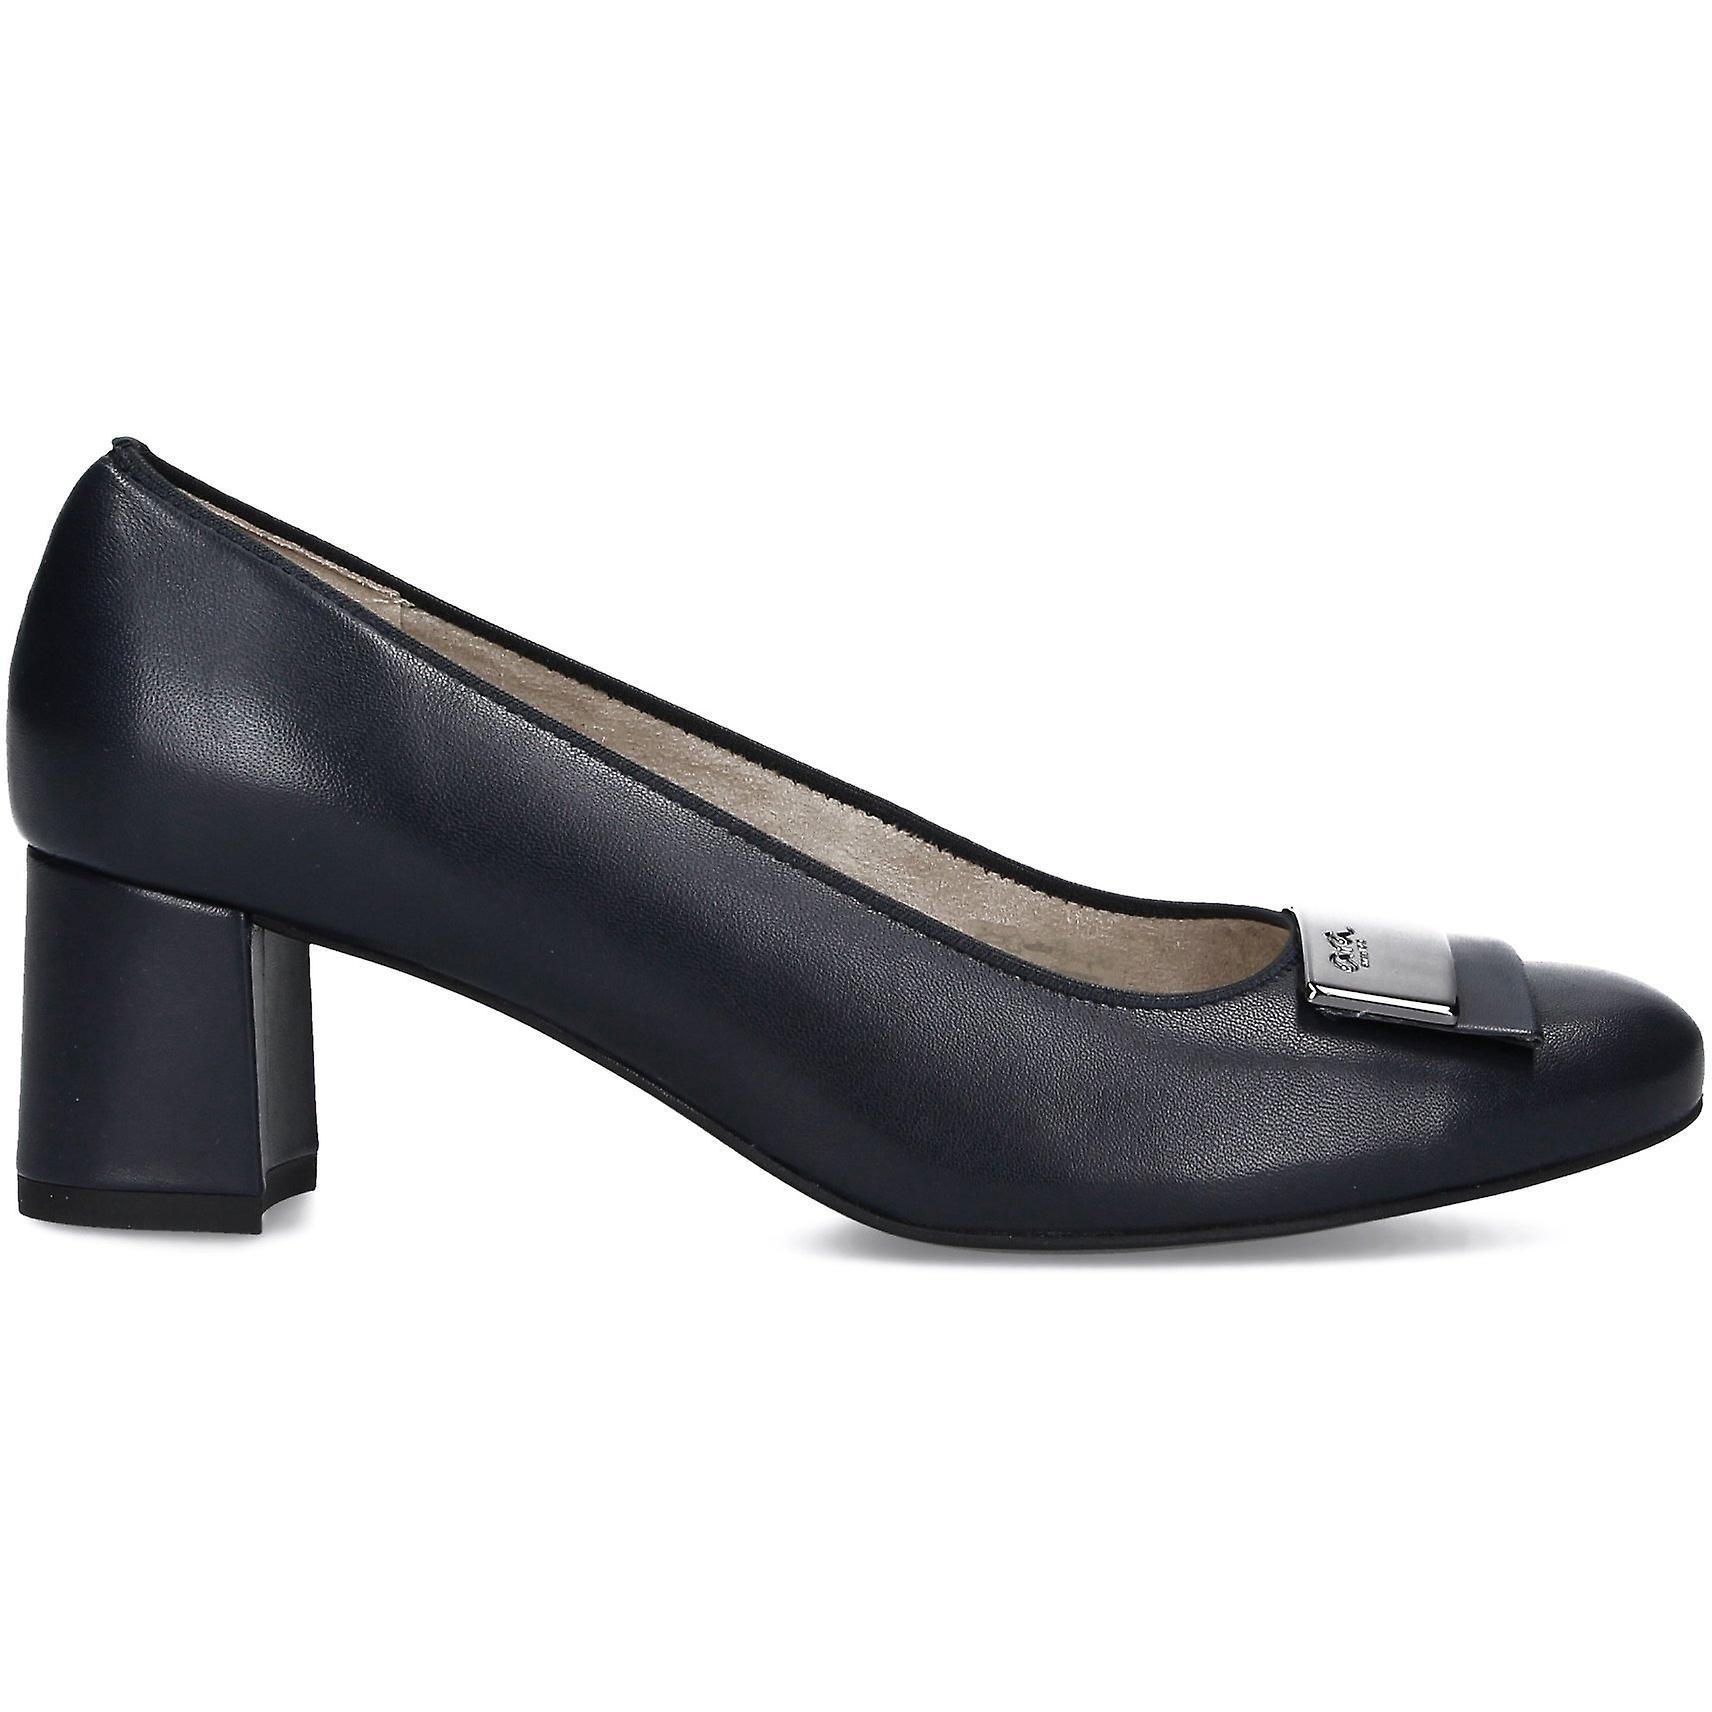 Ara brighton heels womens black